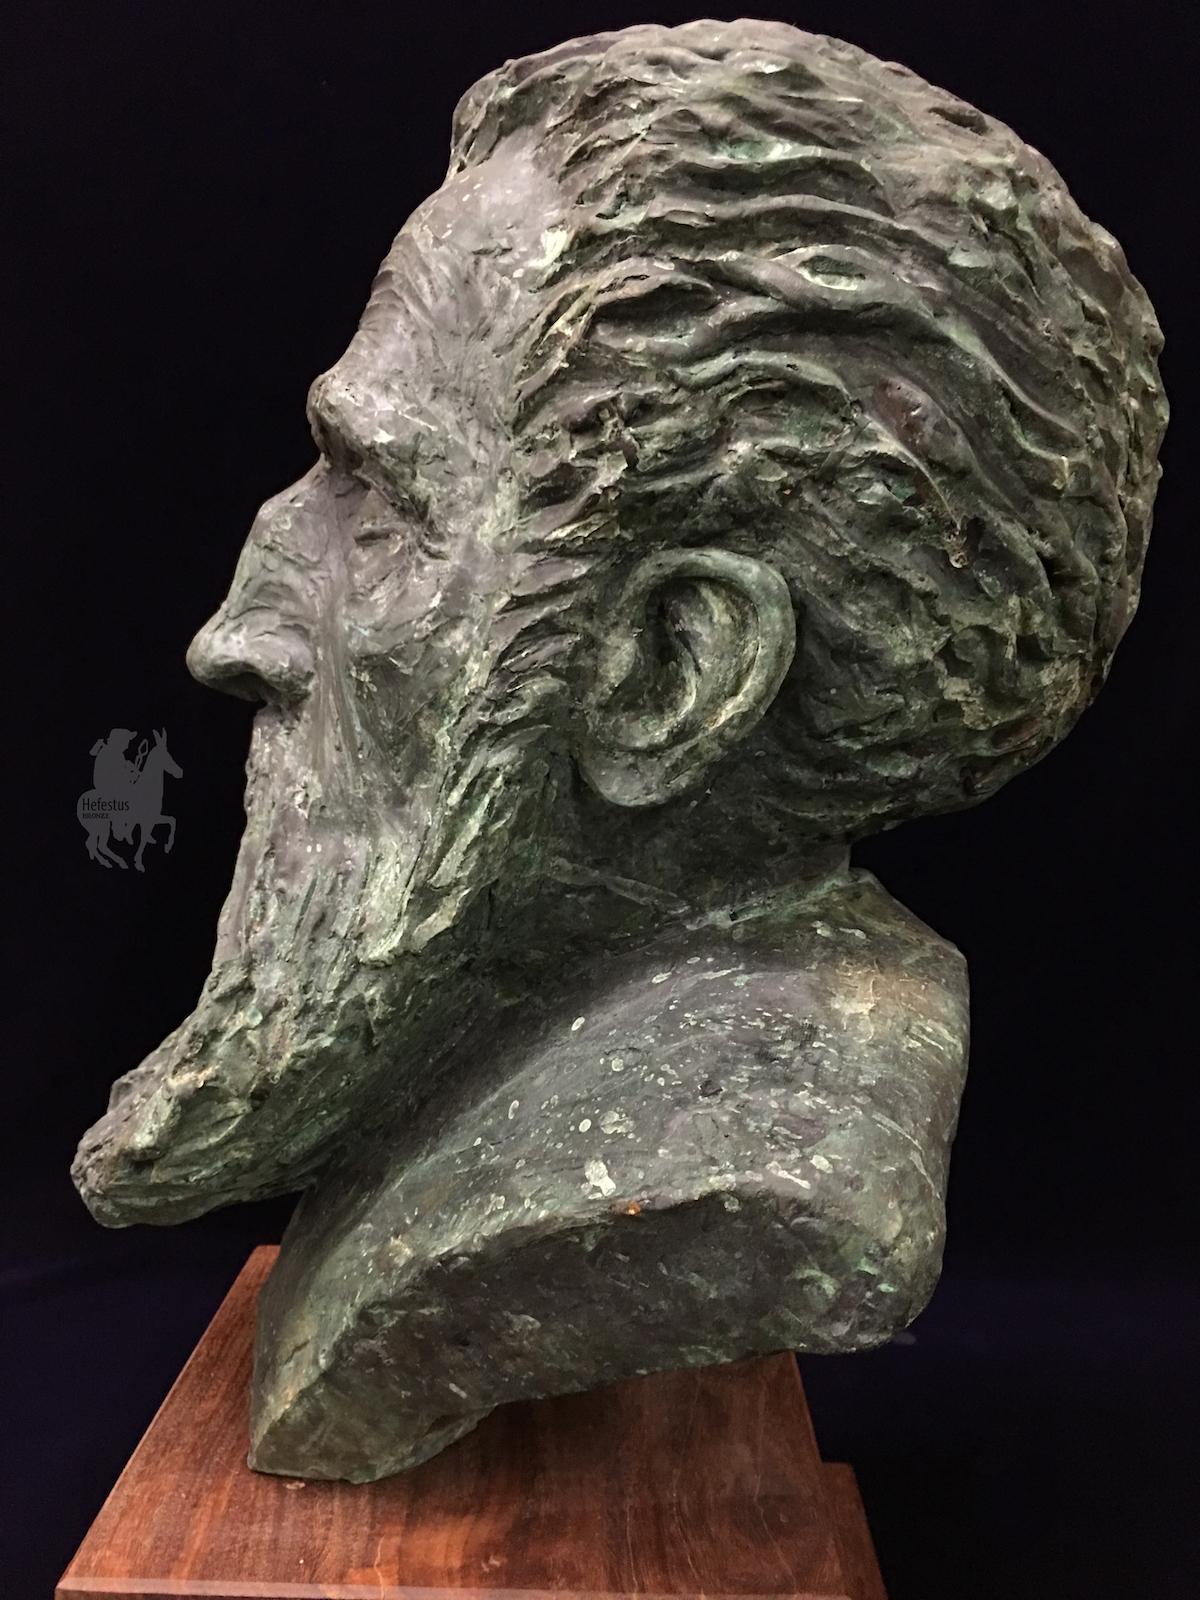 Michelangelo-ChrisDenham-11.jpg